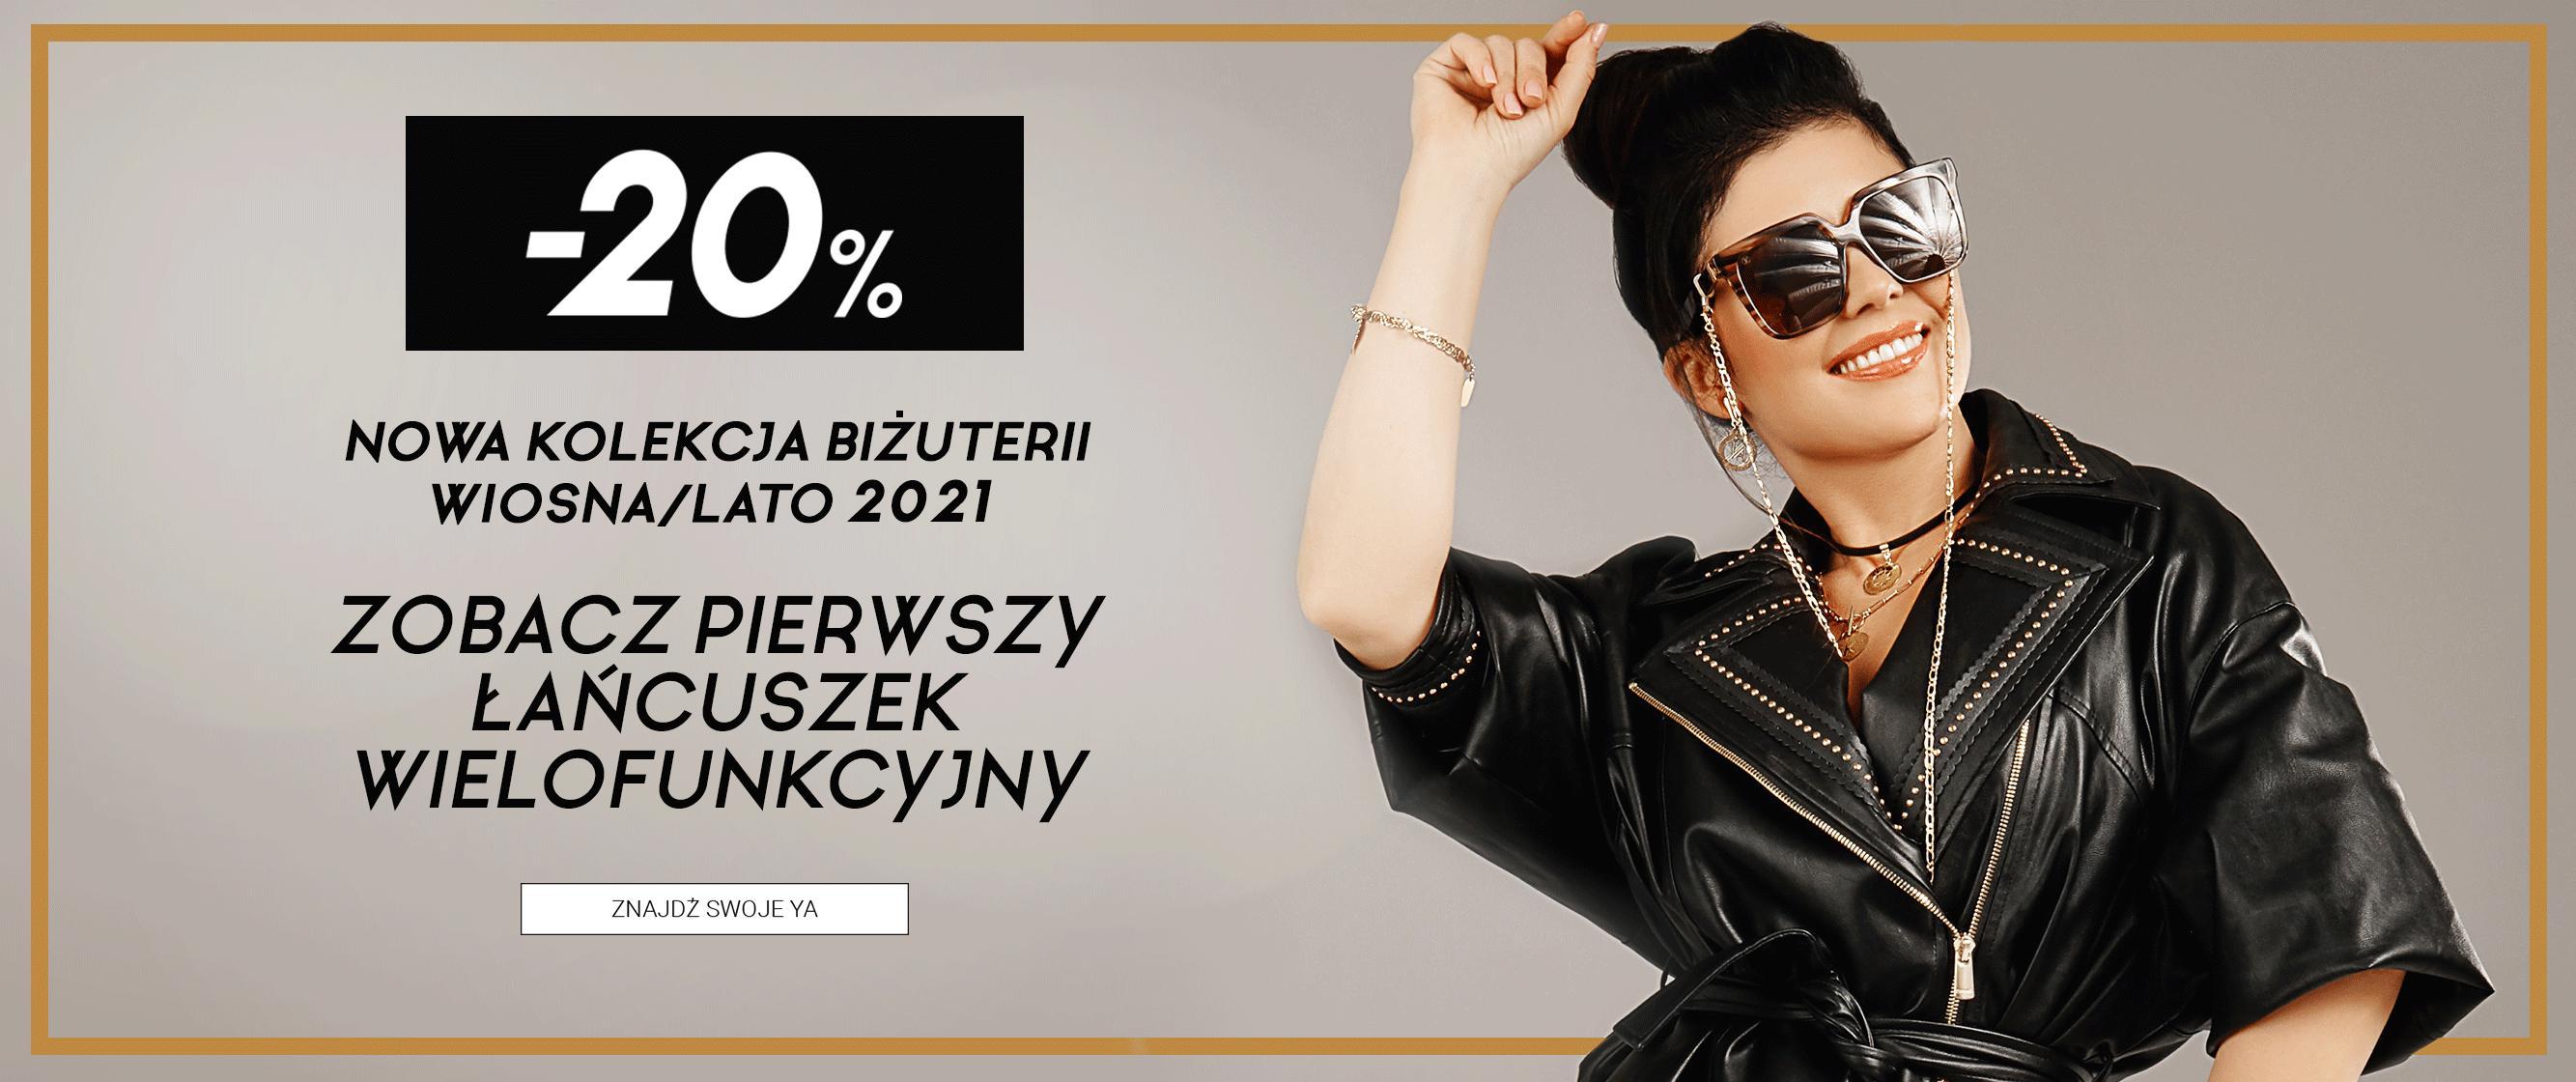 YA Cichopek YA Cichopek: 20% rabatu na nową kolekcję biżuterii wiosna/lato 2021